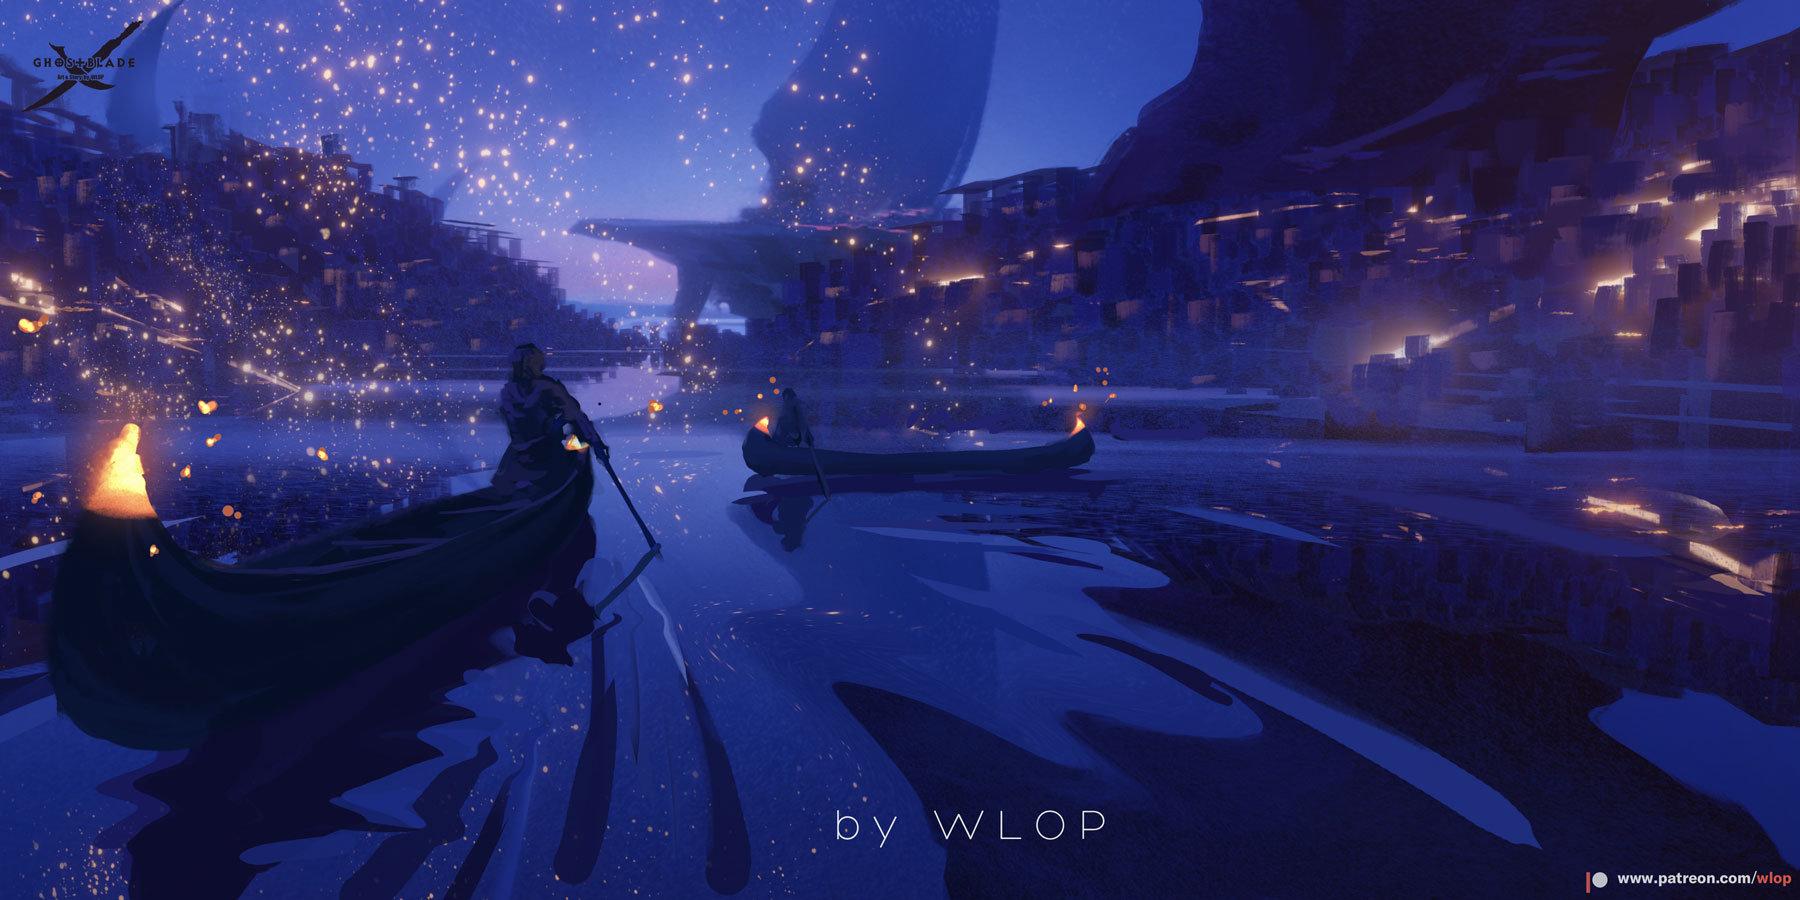 Wallpaper : WLOP, Ghost Blade, anime girls 1800x900